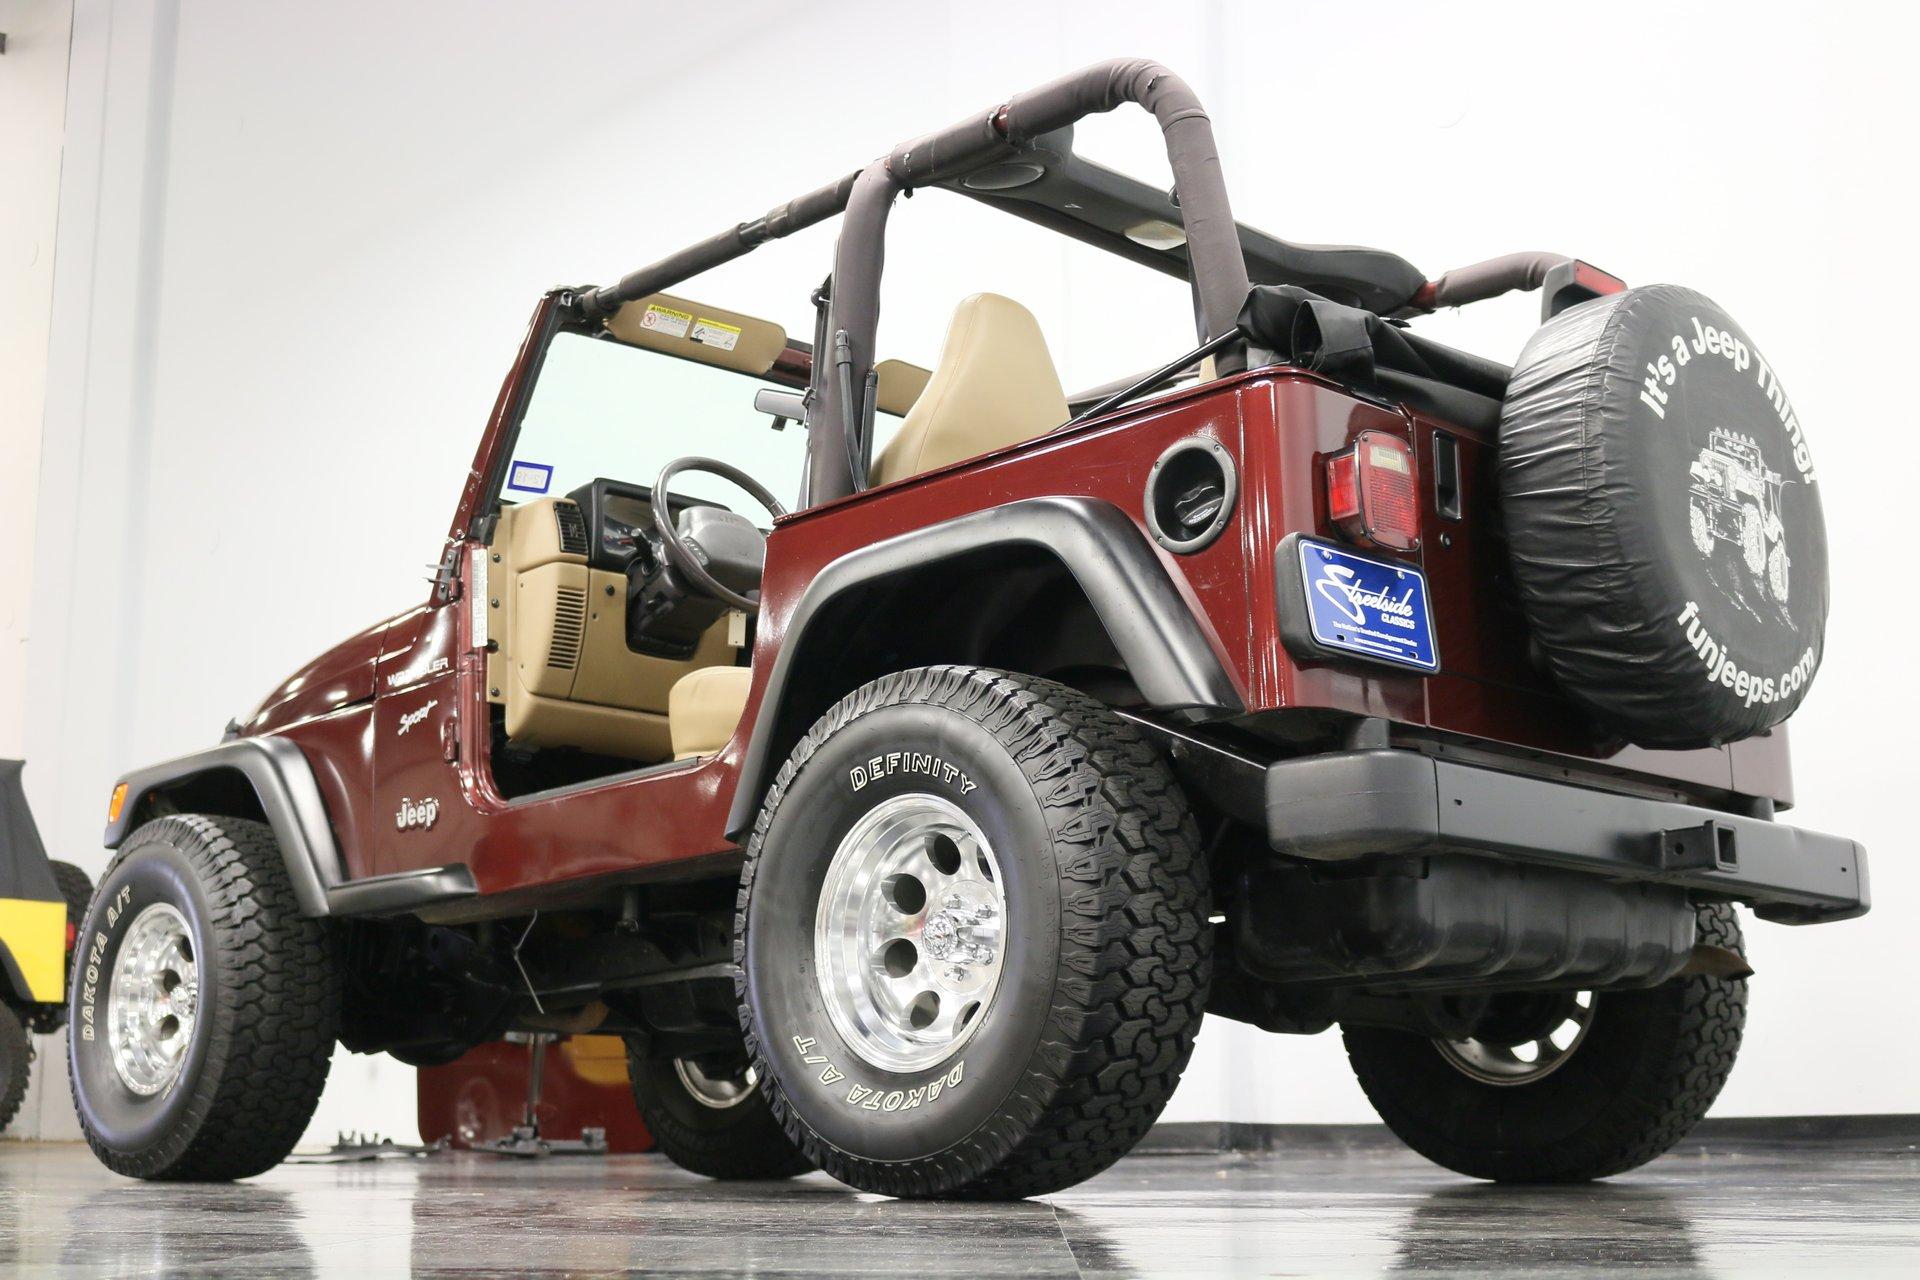 2001 Jeep Wrangler Streetside Classics The Nation S Trusted